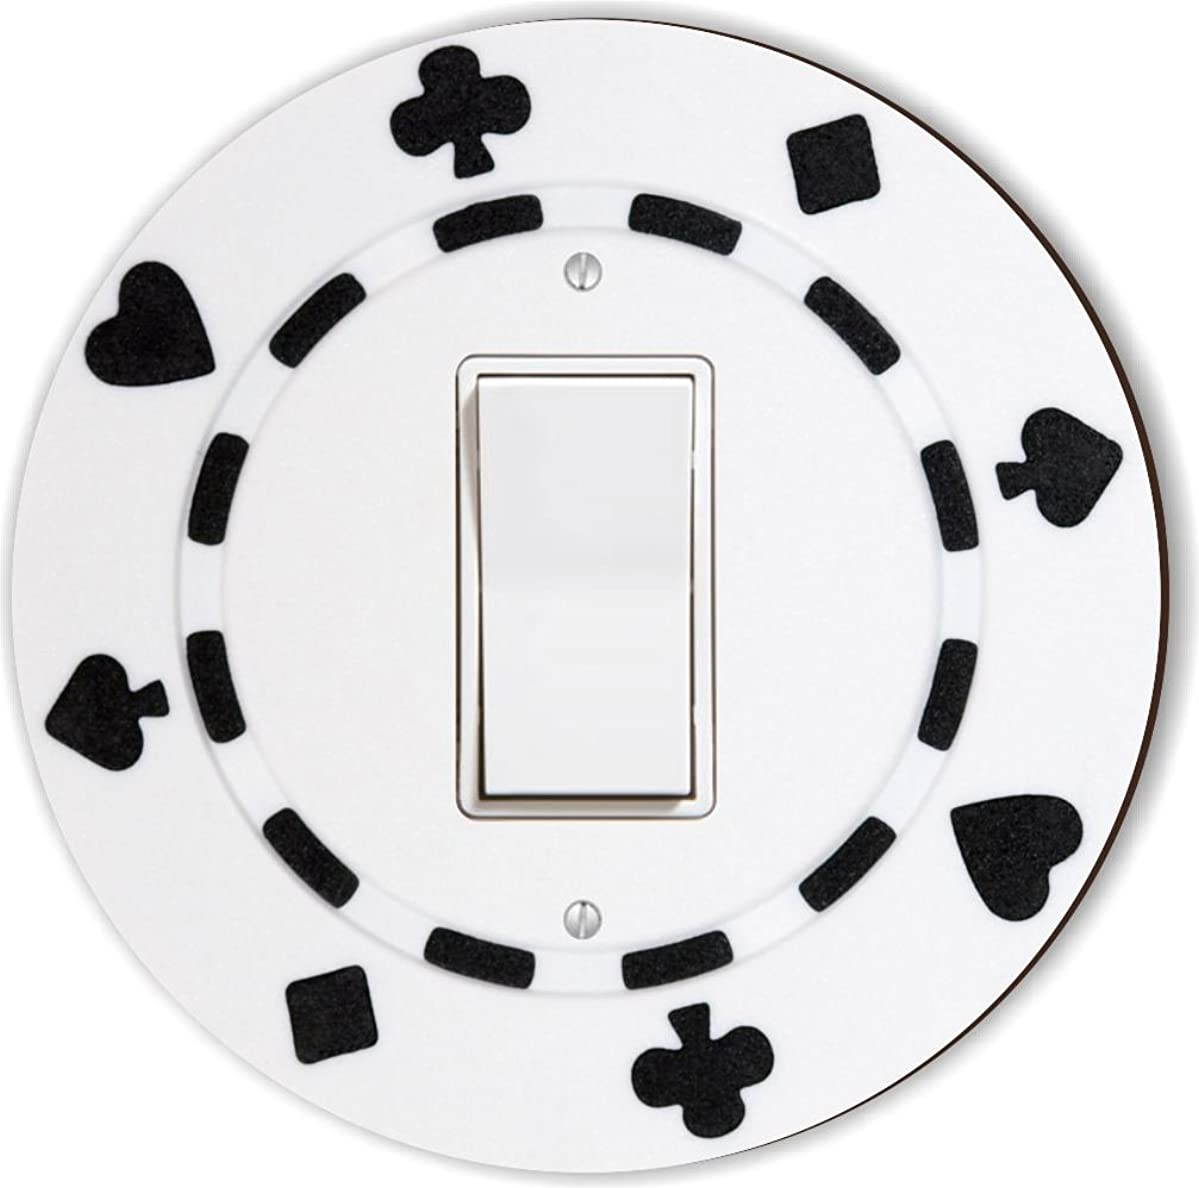 Rikki Knight RND-LSPROCK-84 Poker Chip Round Single Rocker Light Switch Plate, White/Black